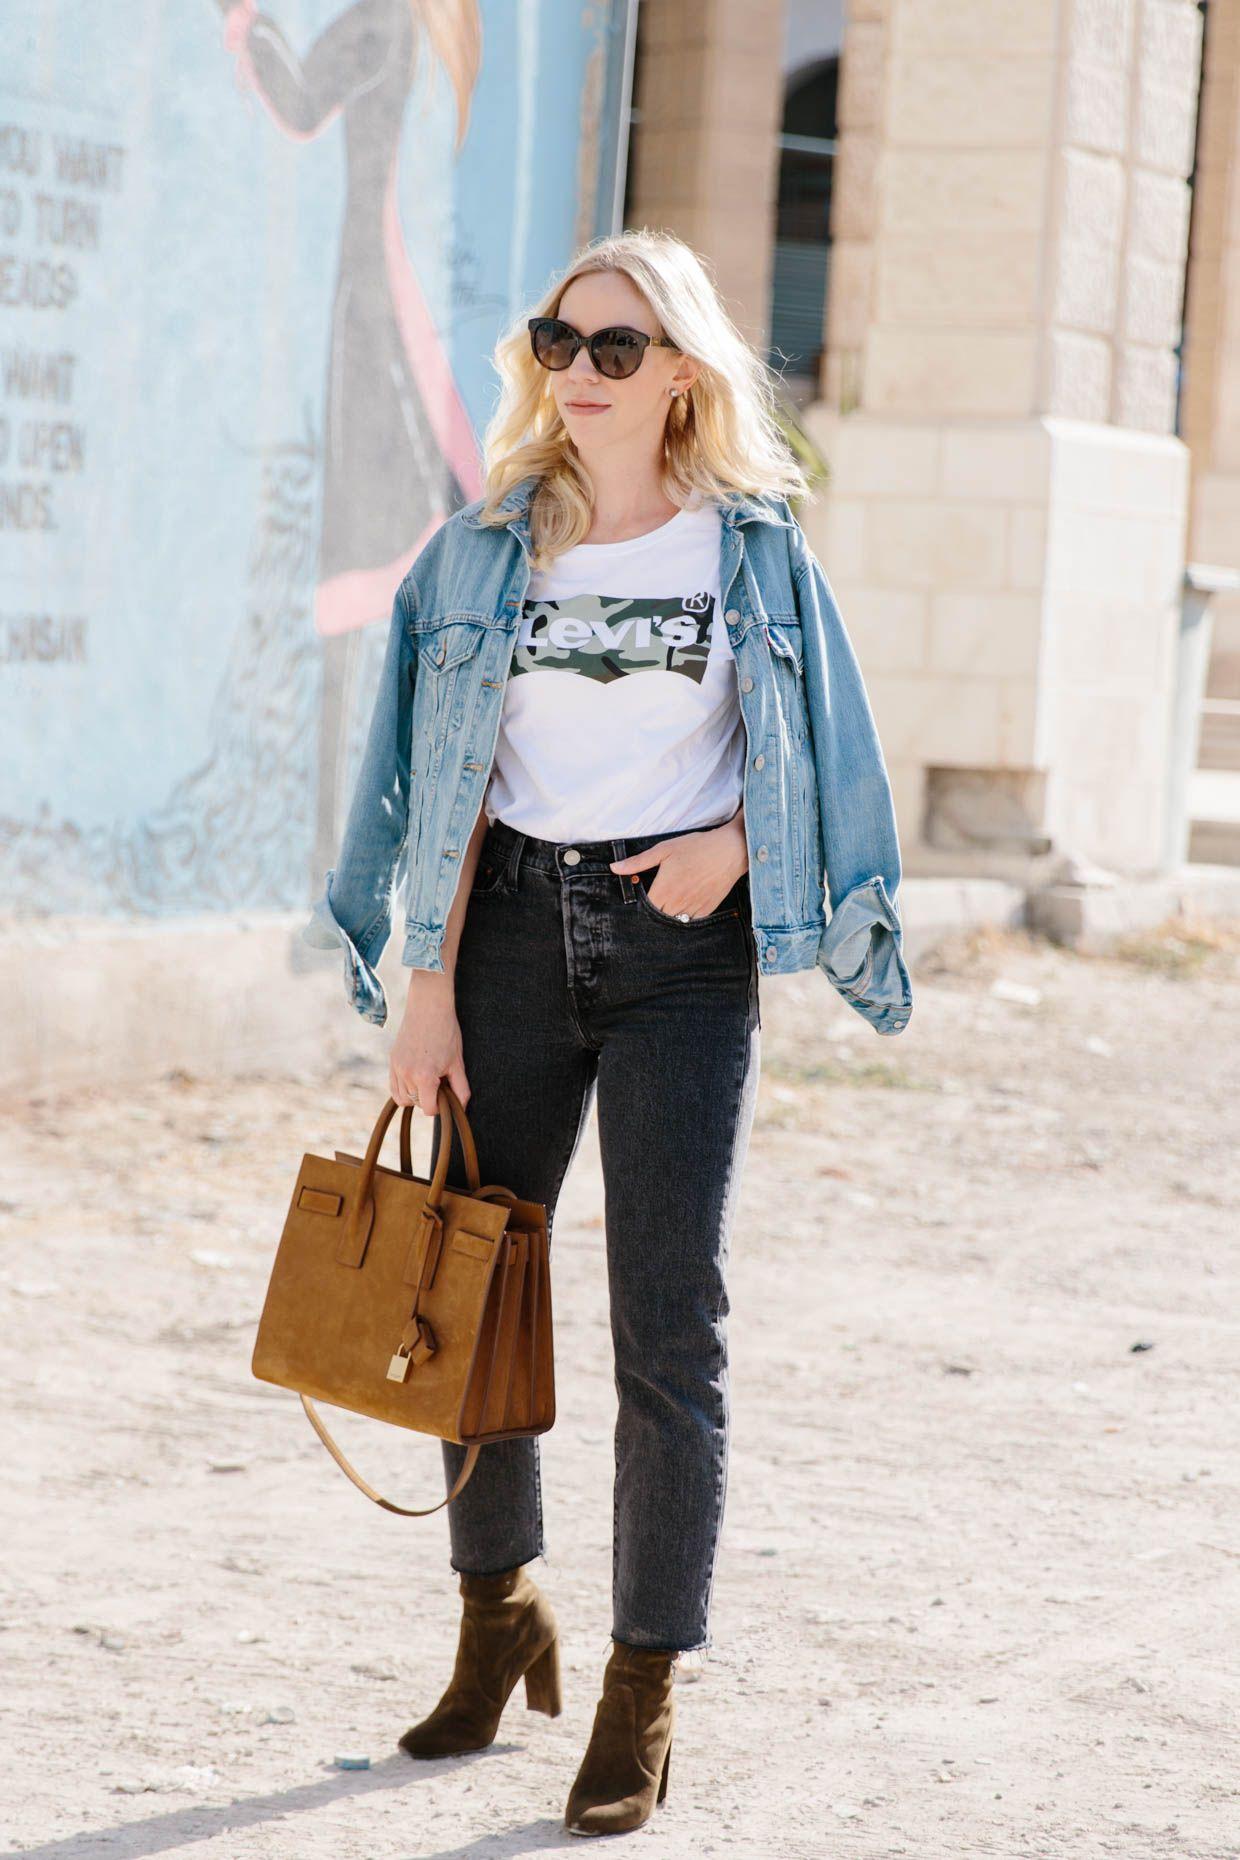 Levius love denim jacket with graphic tee u straight leg jeans